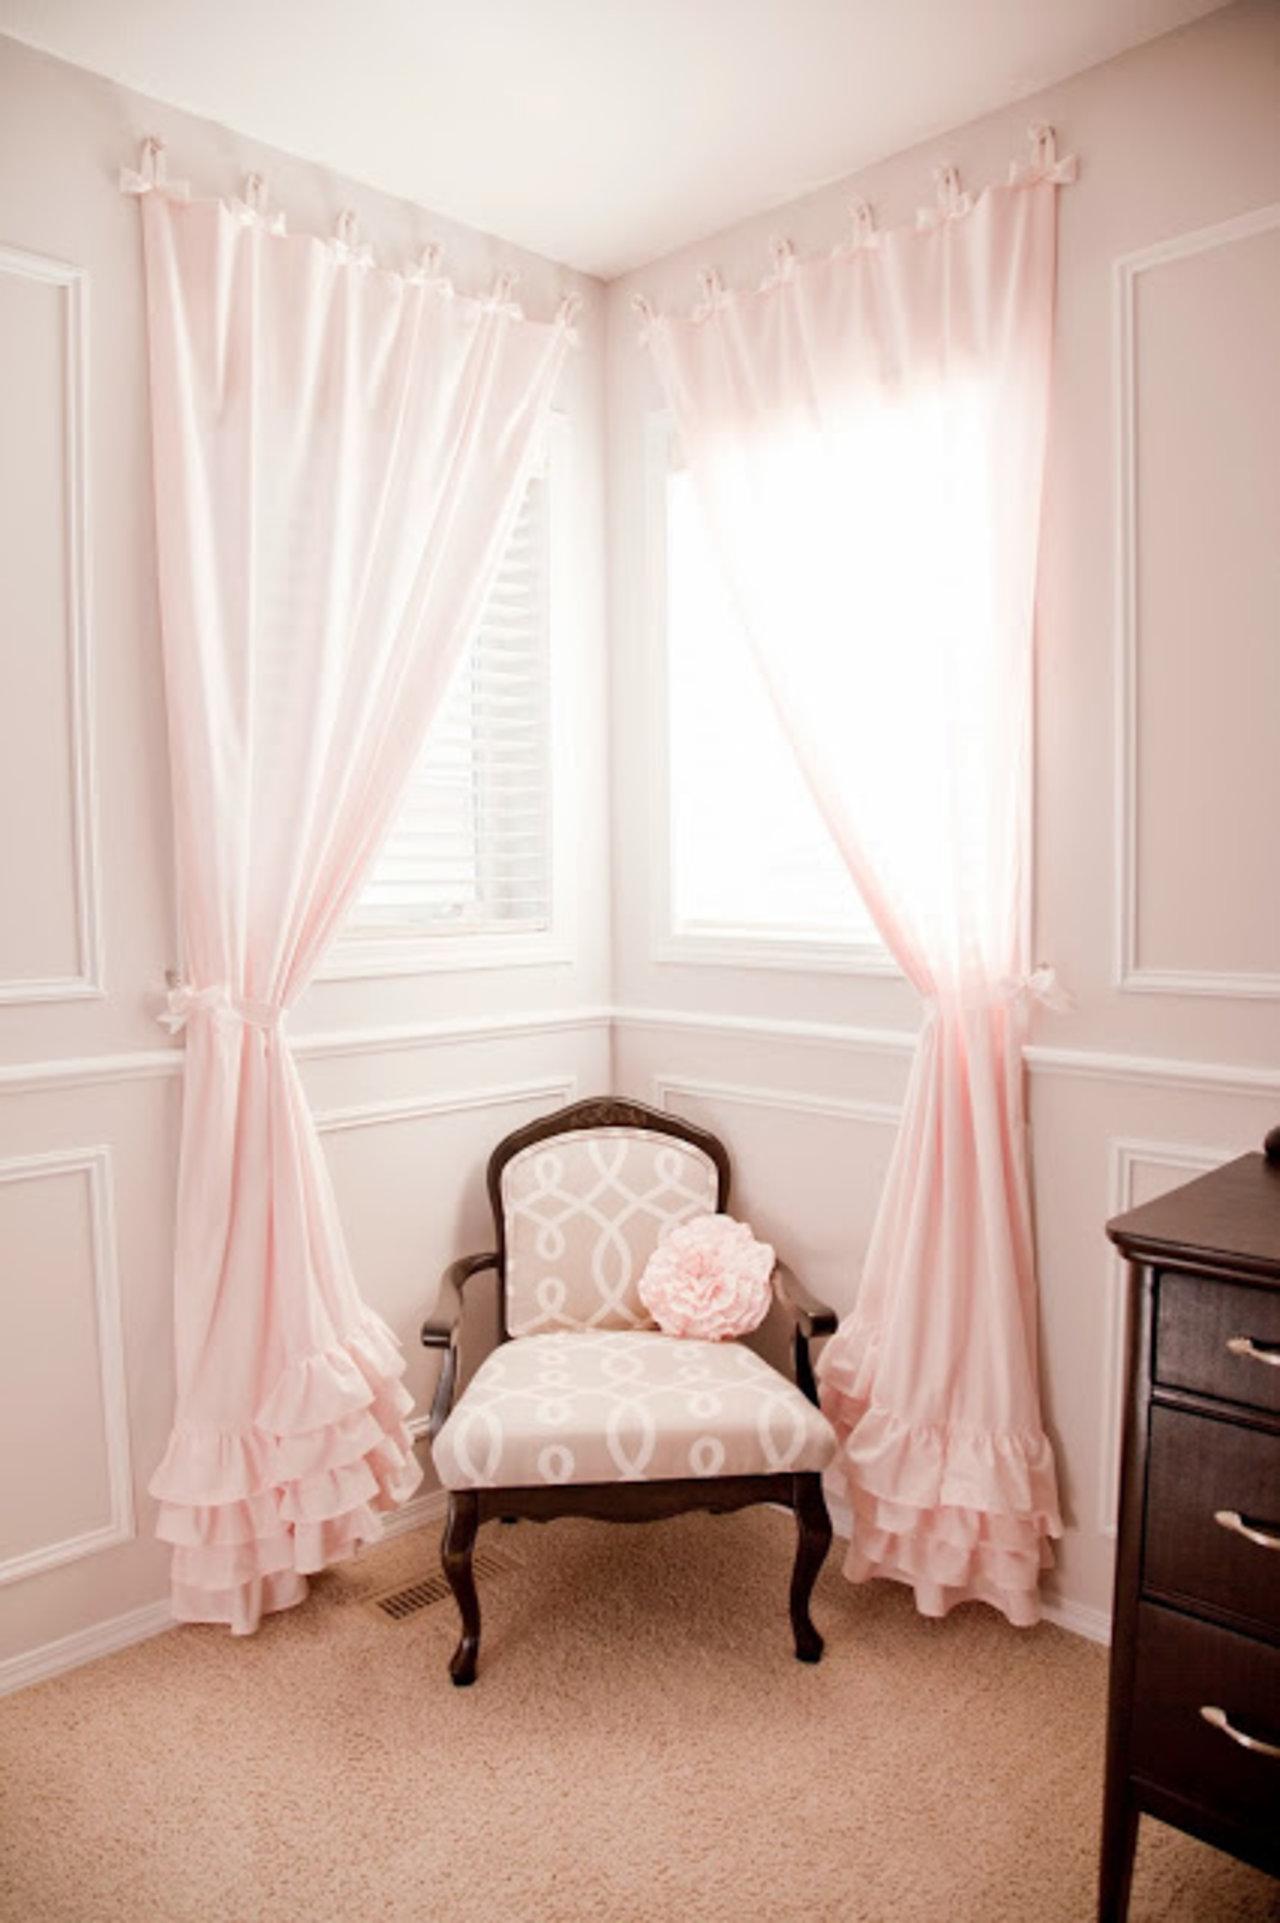 Corner Window Curtains: Styles of Decorating Ideas